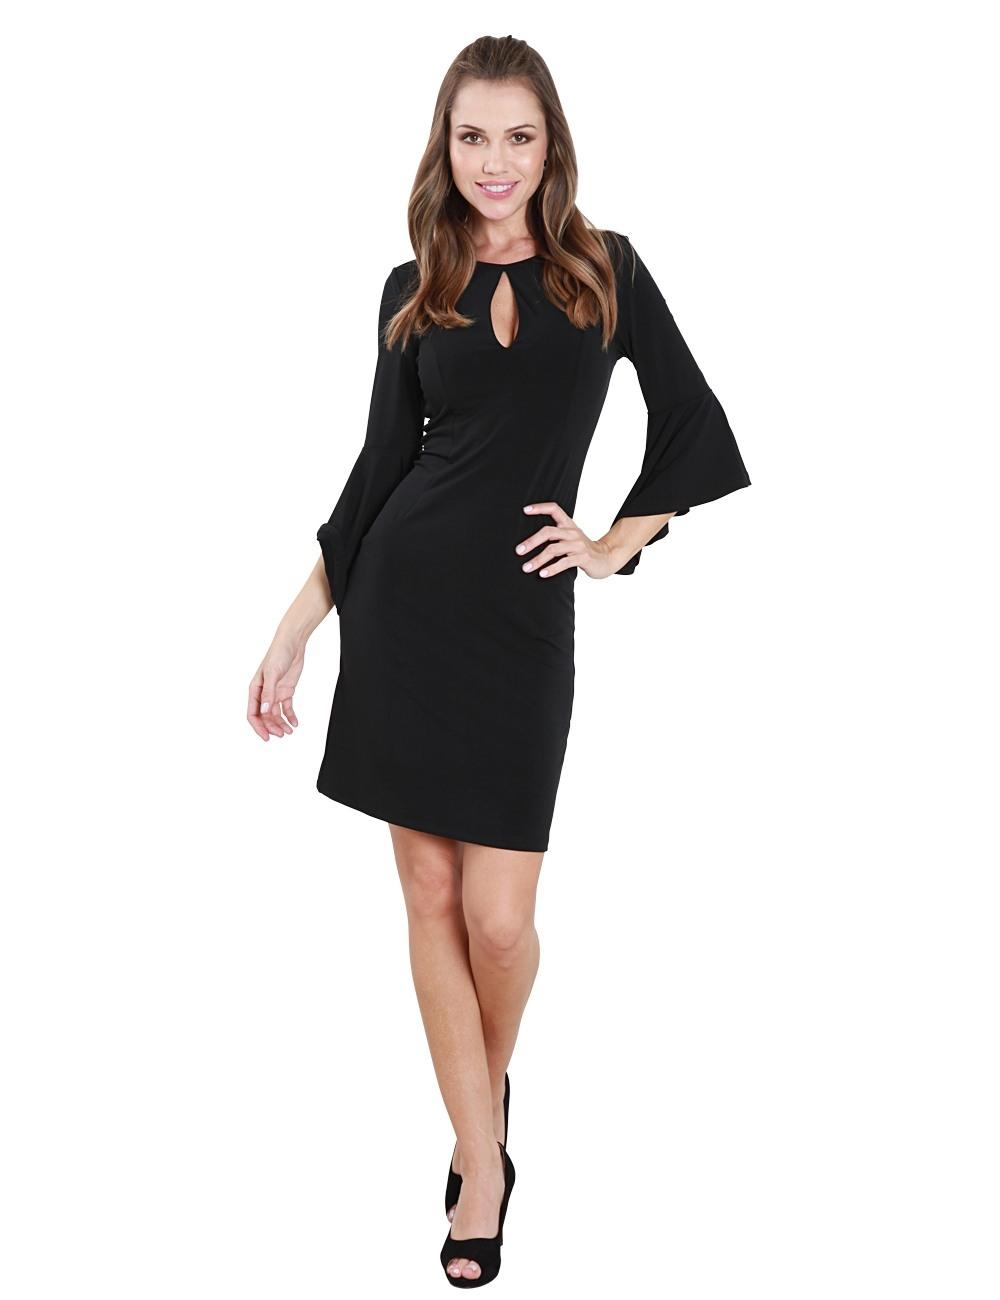 20 Schön Kleid Mit Cut Outs StylishFormal Wunderbar Kleid Mit Cut Outs Vertrieb